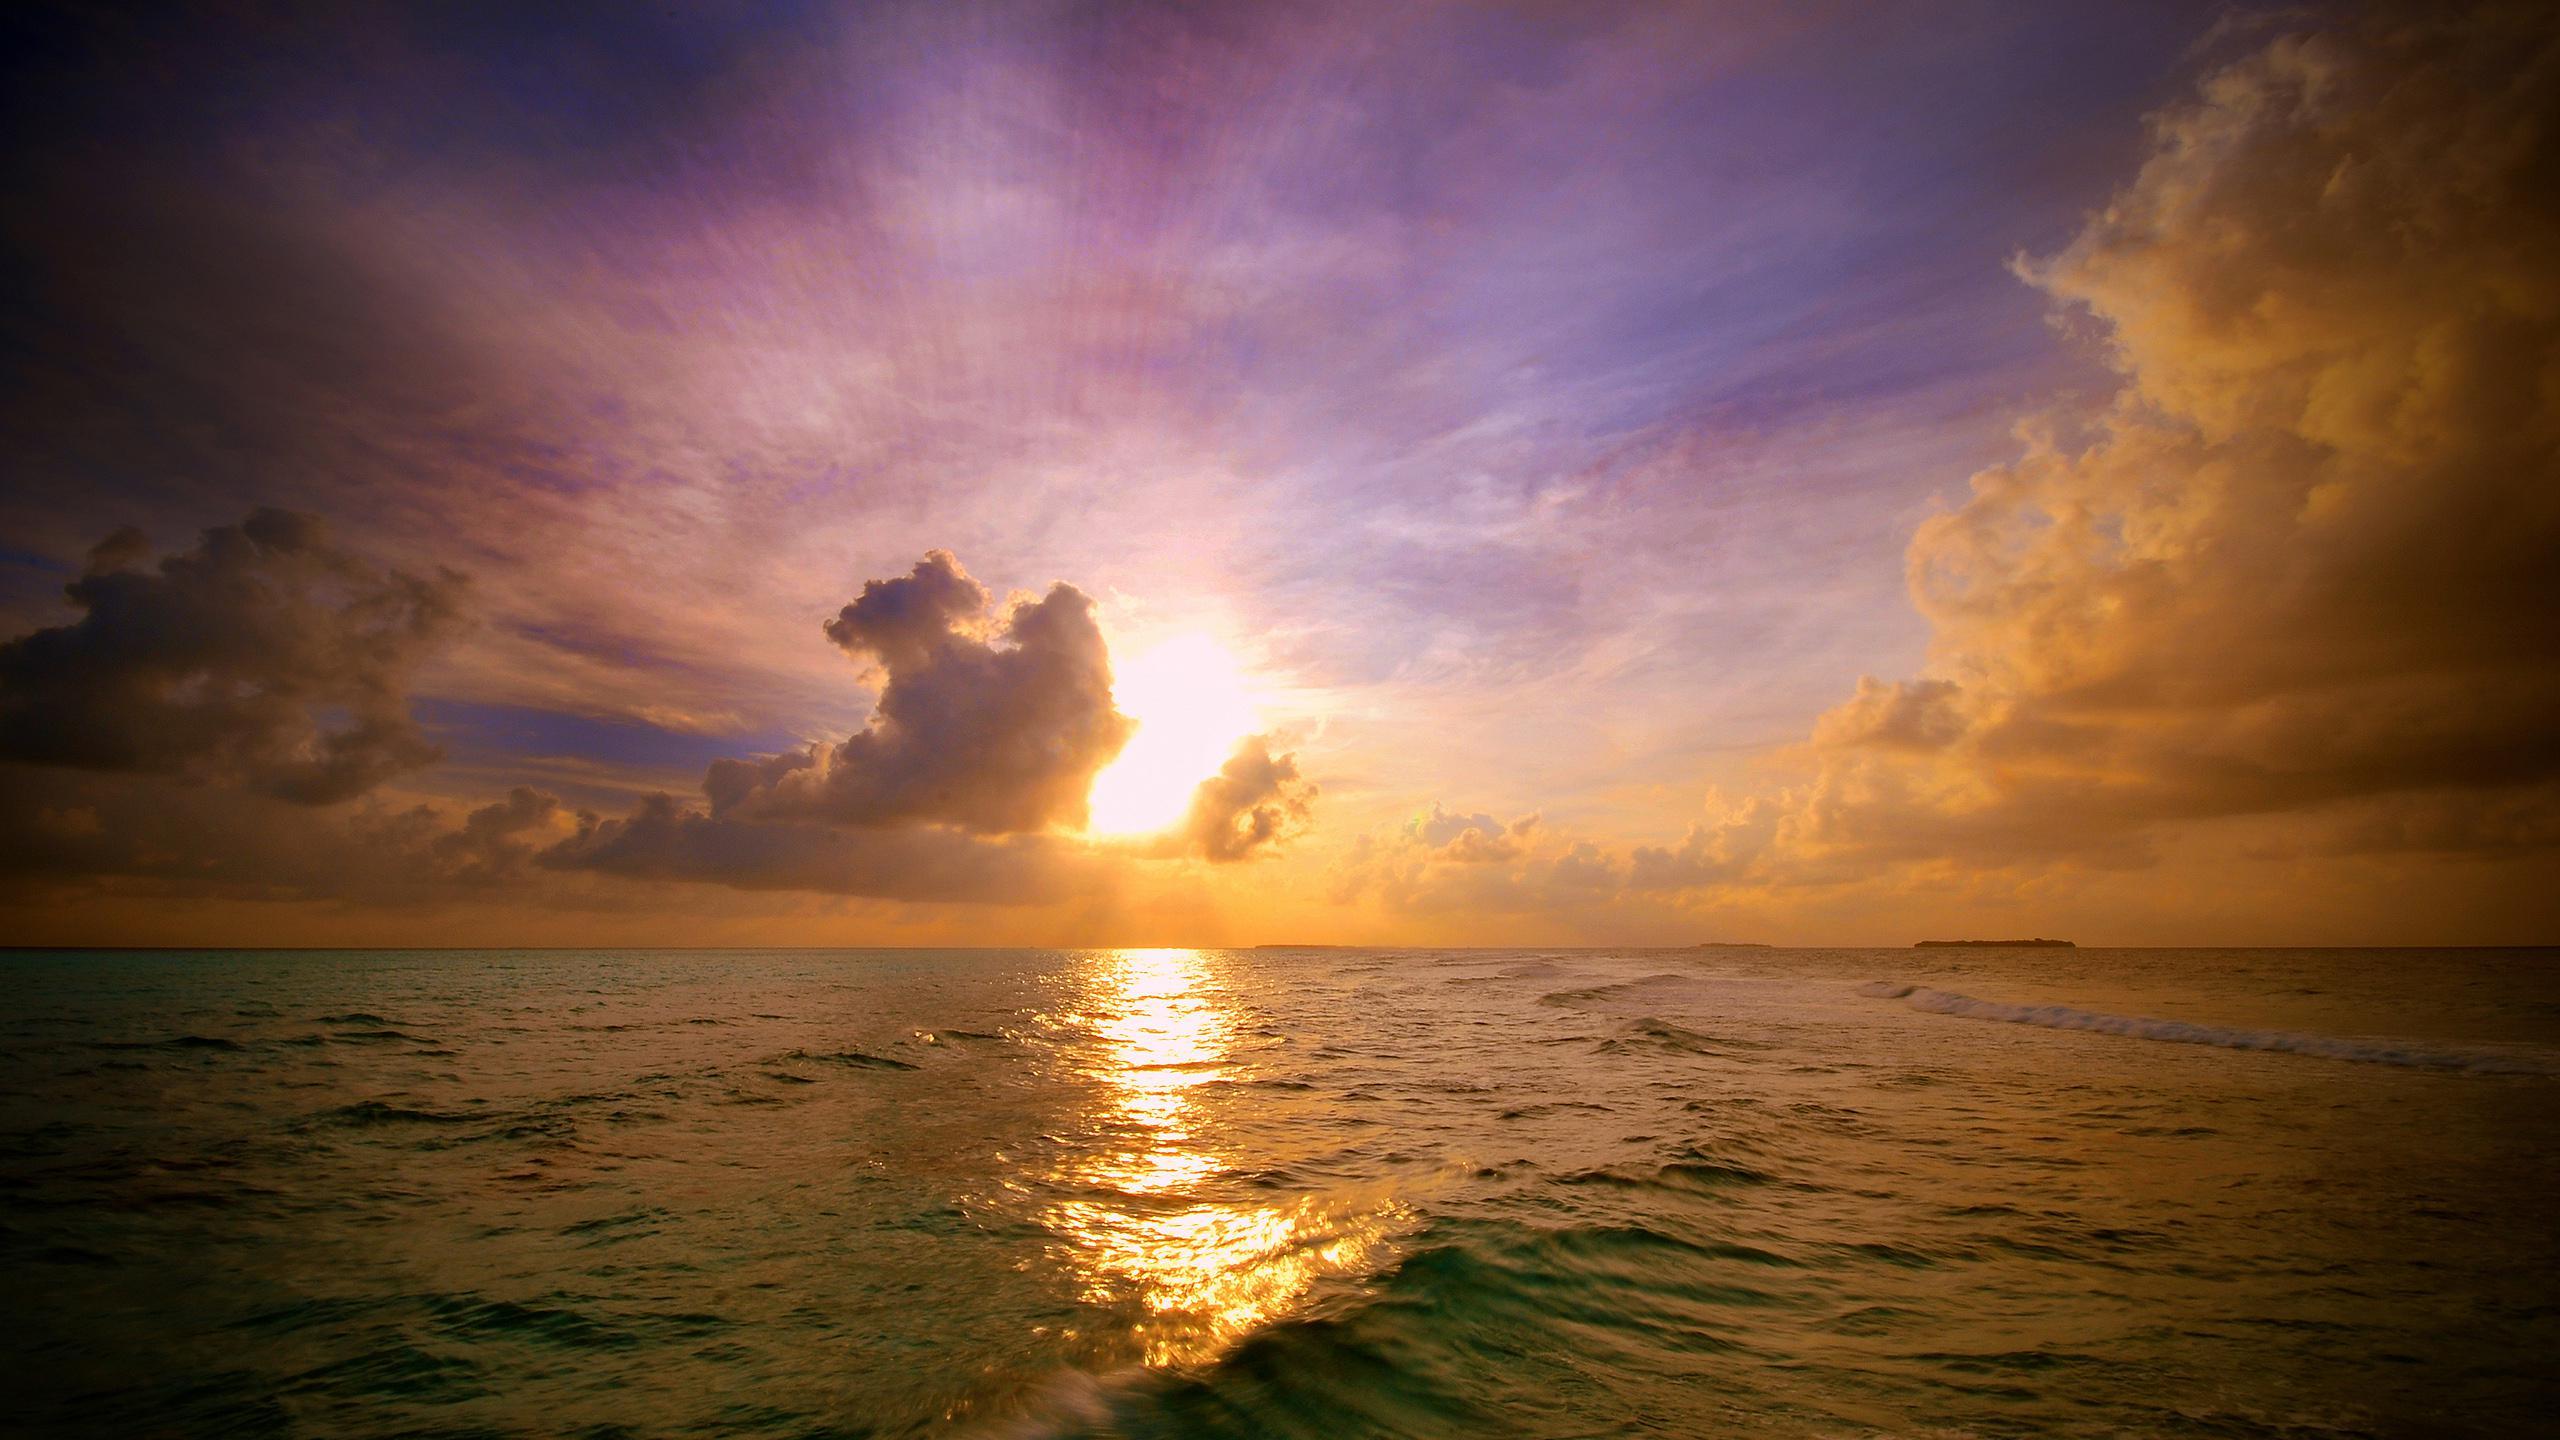 Hd Sunset Clouds Sea Background Images Wallpaper - Beautiful Ocean Sunset - HD Wallpaper